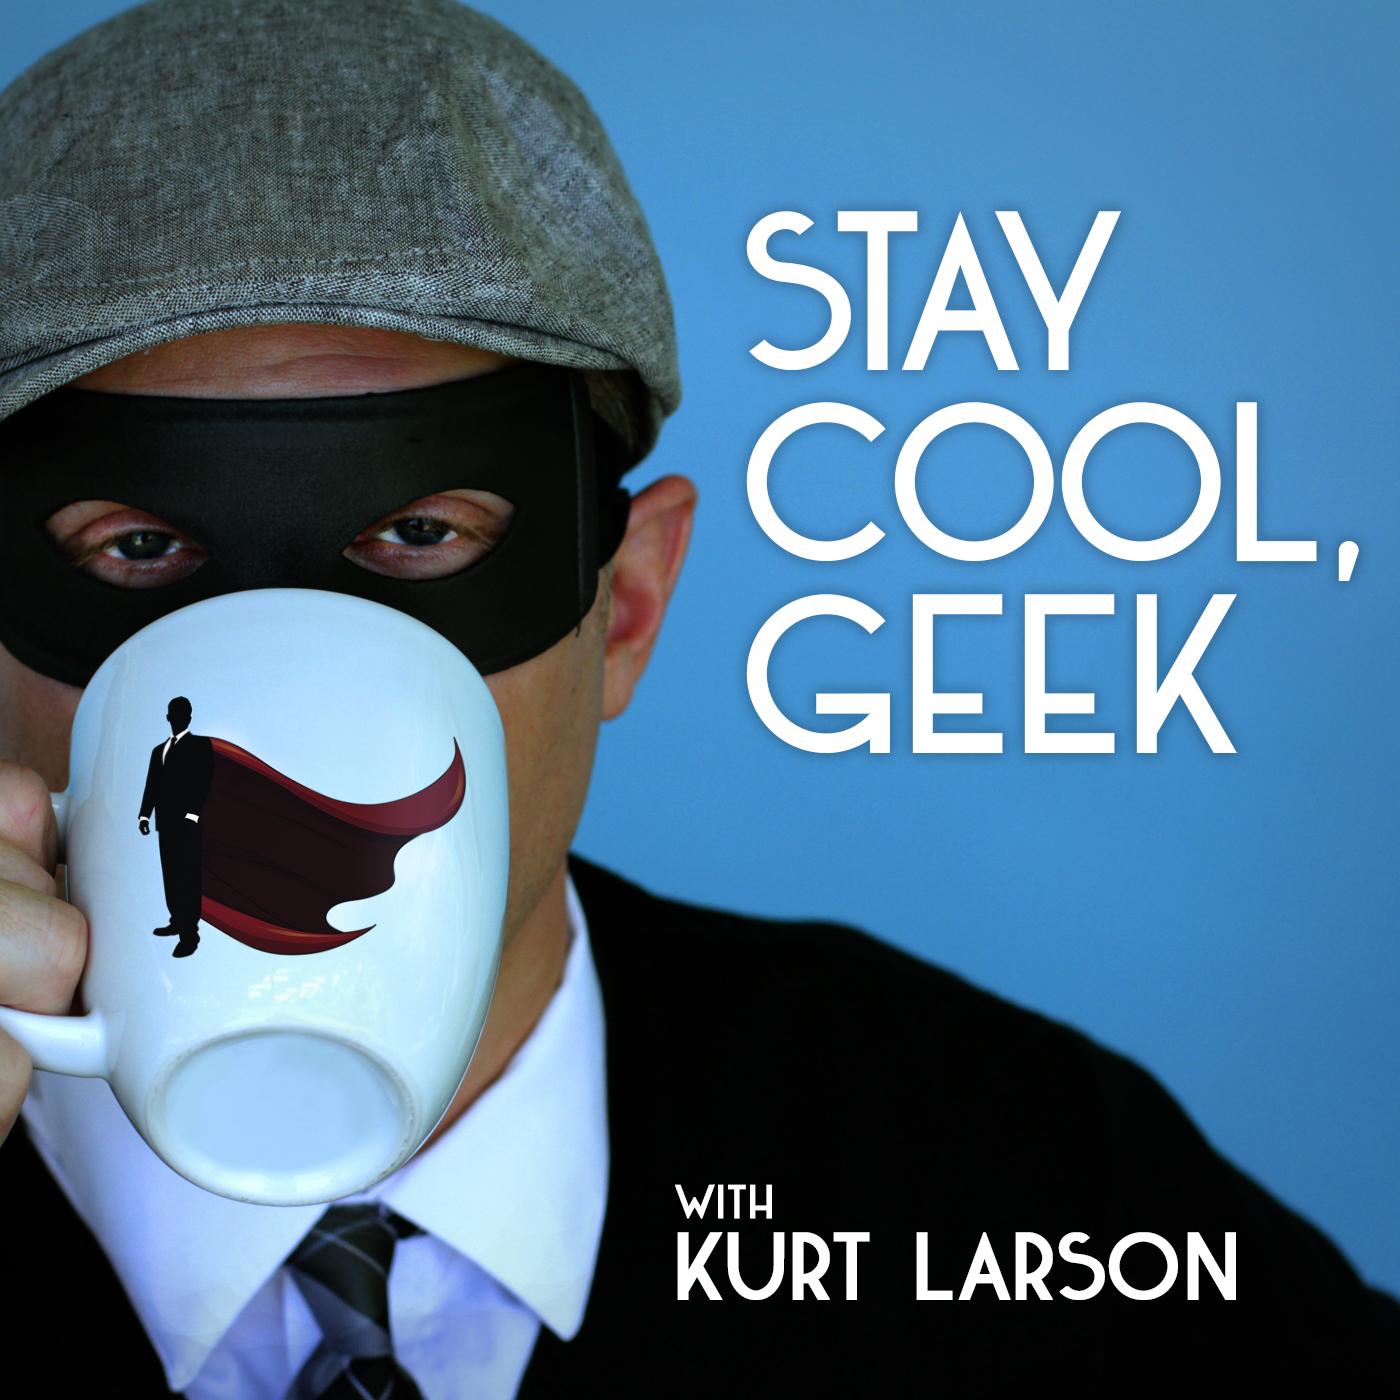 Stay Cool, Geek logo